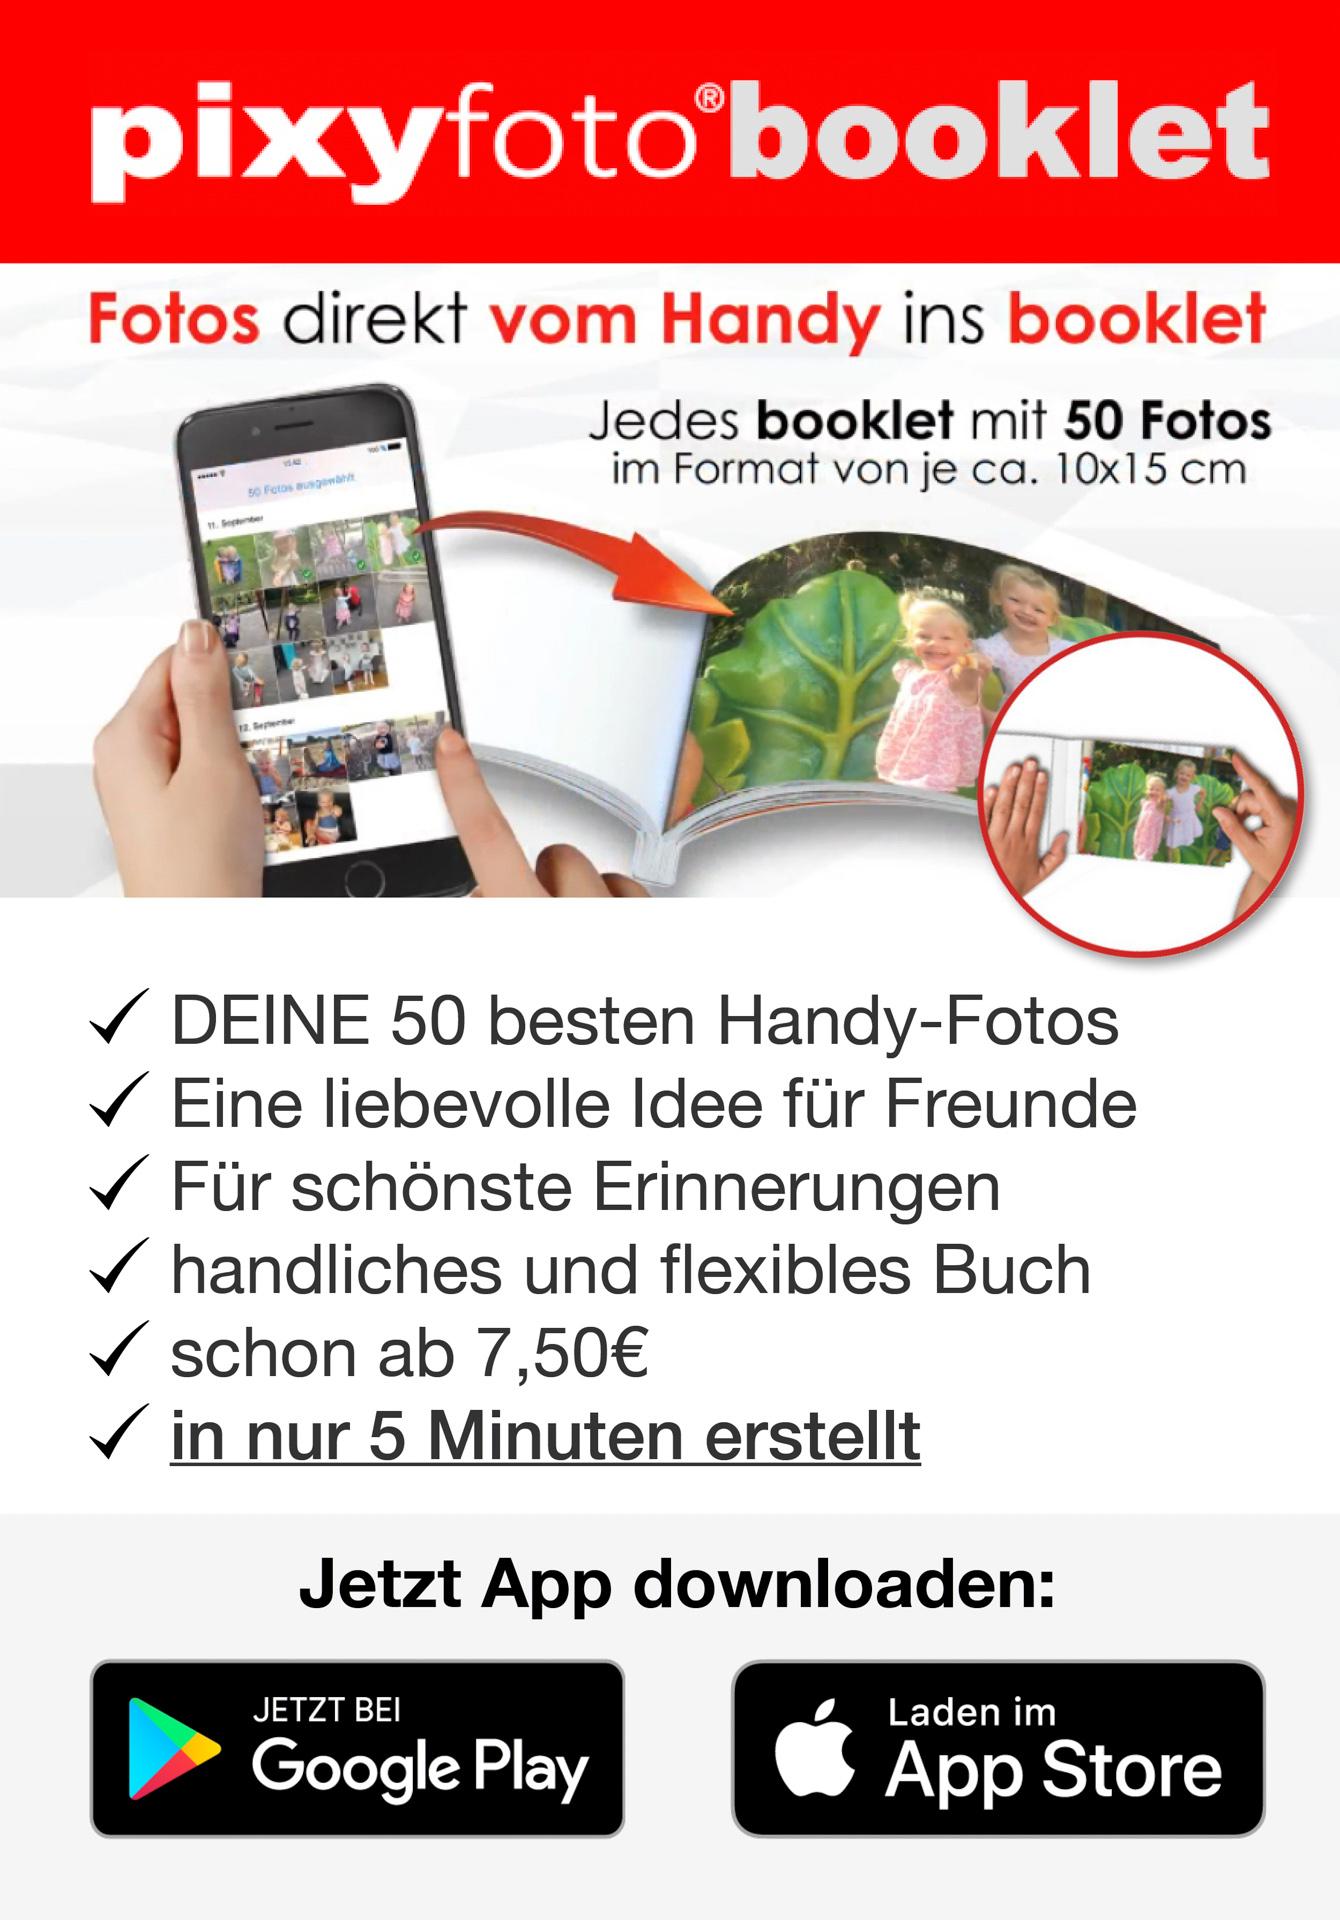 gniced-daniel gross-pfaffenhofen-grafikdesign-digital-assets-posting-15